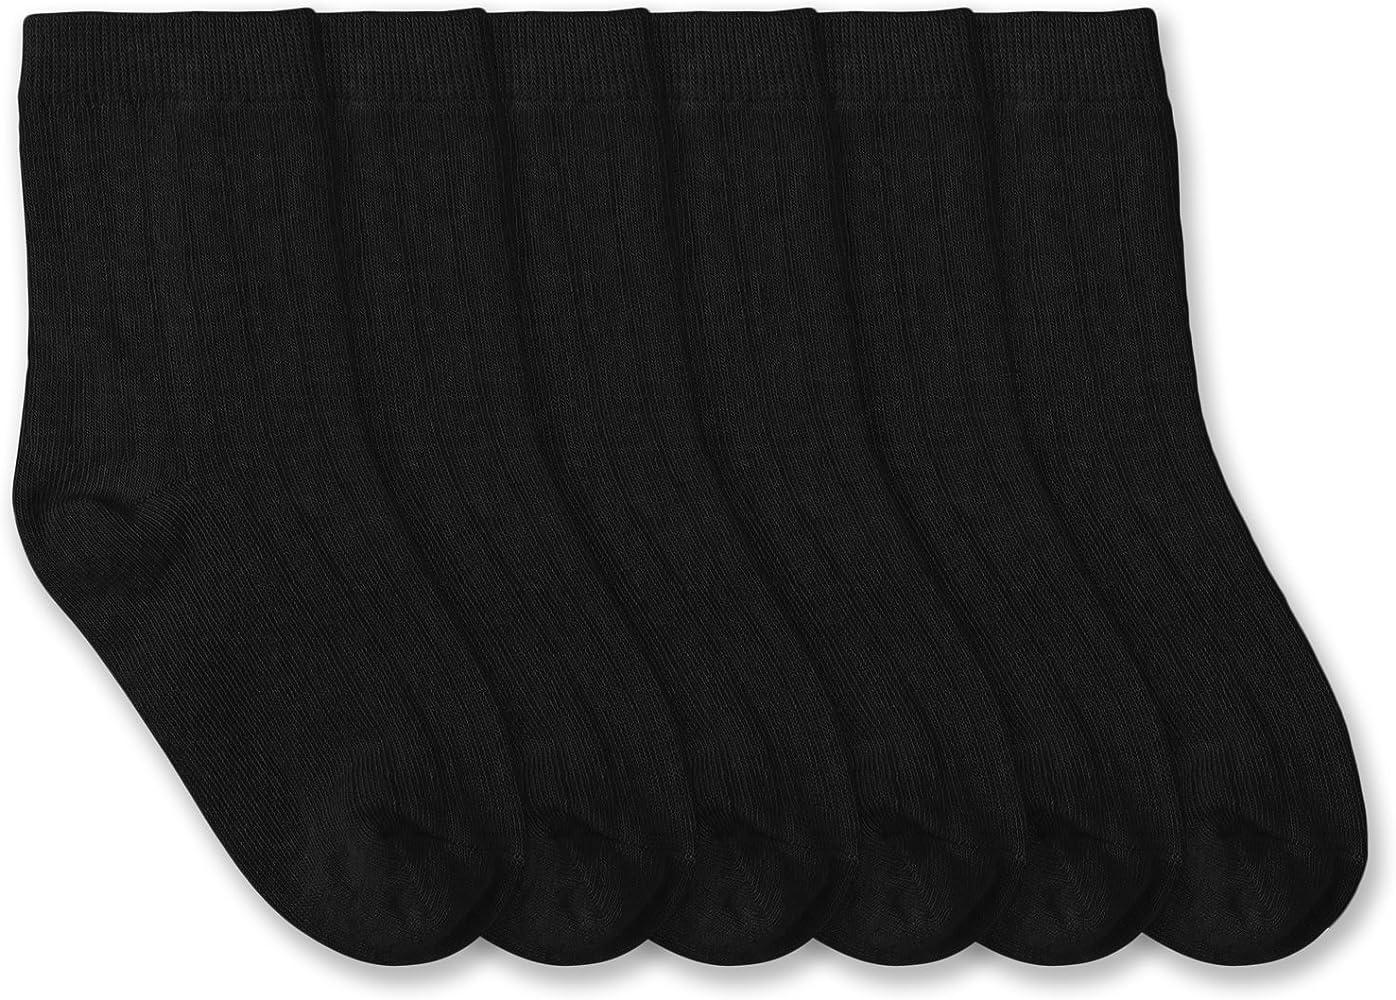 e771ebb4f027f Jefferies Socks Boys School Uniform Rib Crew Socks 6 Pair Pack (Toddler -  USA Shoe